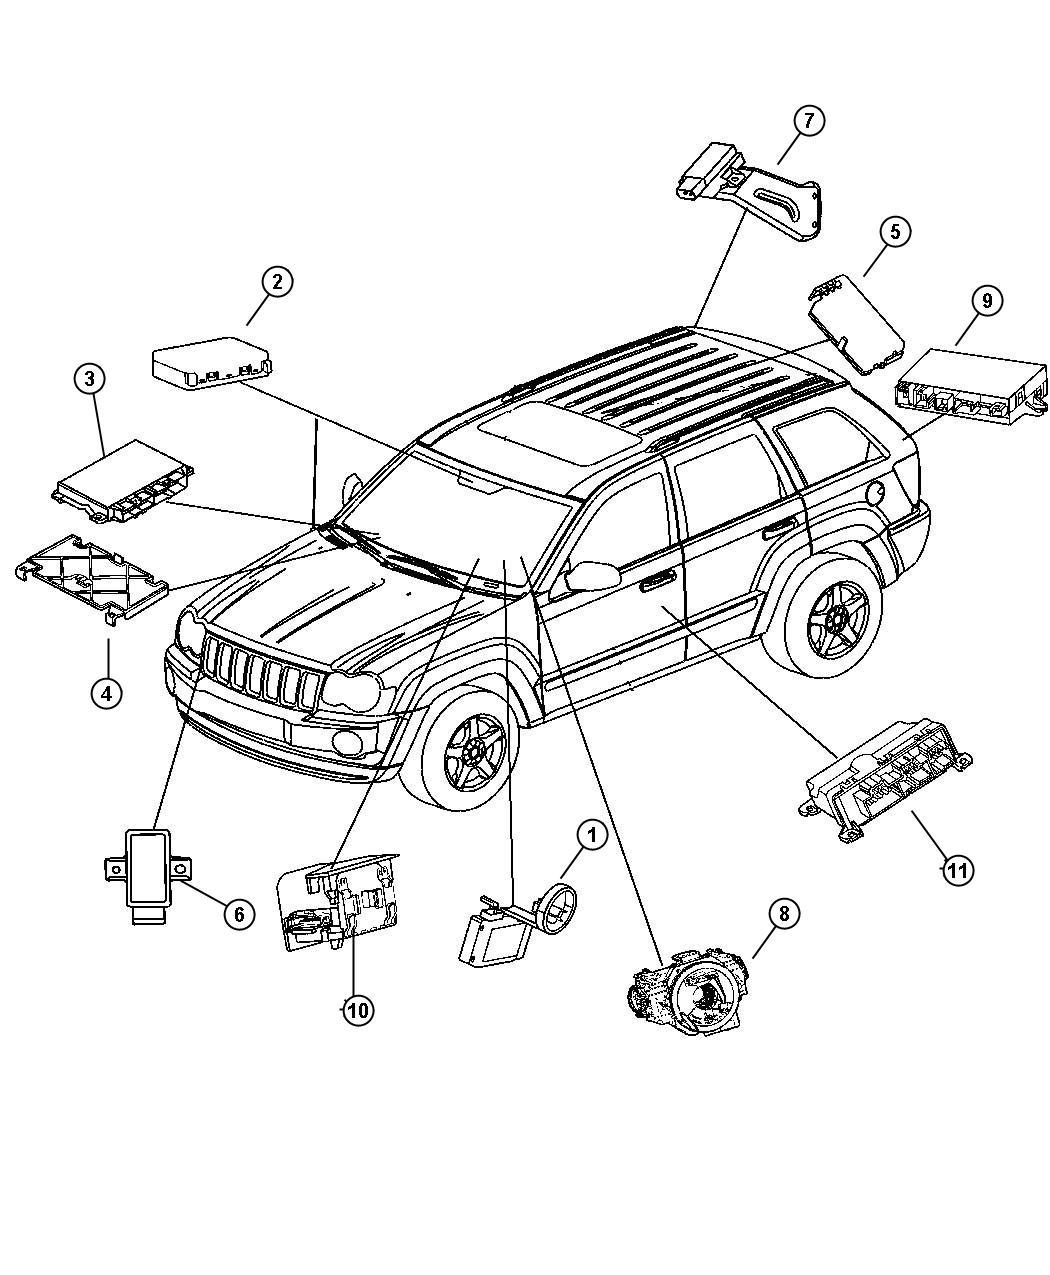 2006 Jeep Commander Module. Transmission control